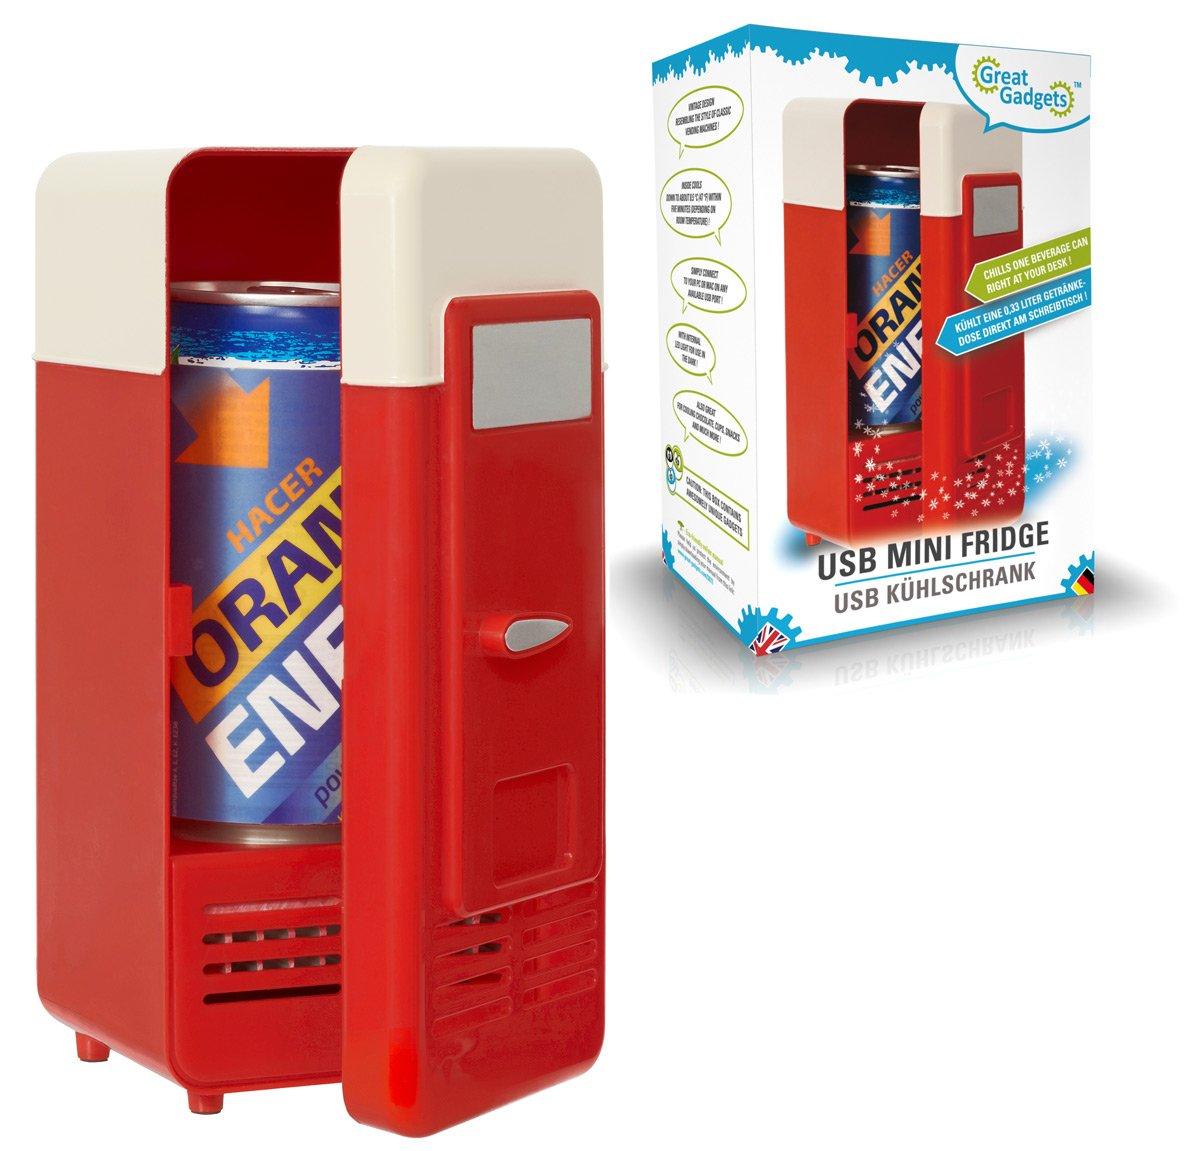 GreatGadgets 3072-1 USB Minikühlschrank: Amazon.de: Computer & Zubehör